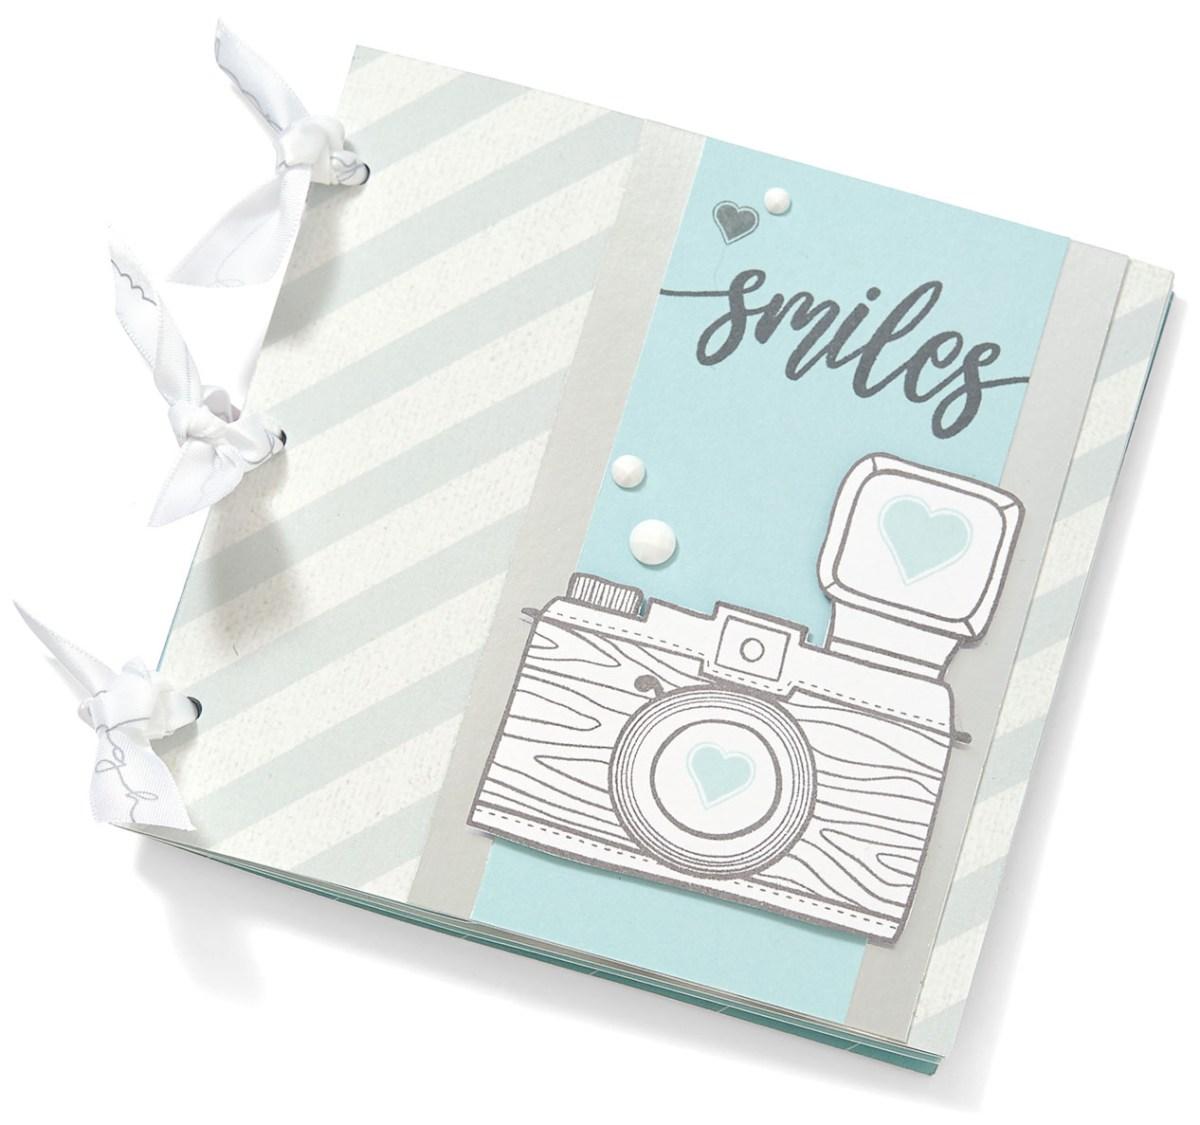 holiday favorites #ctmh #closetomyheart #holiday #ideabook #catalog #catalogue #ohsnap #myacrylix #stamp #camera #smiles #mini #album #blue